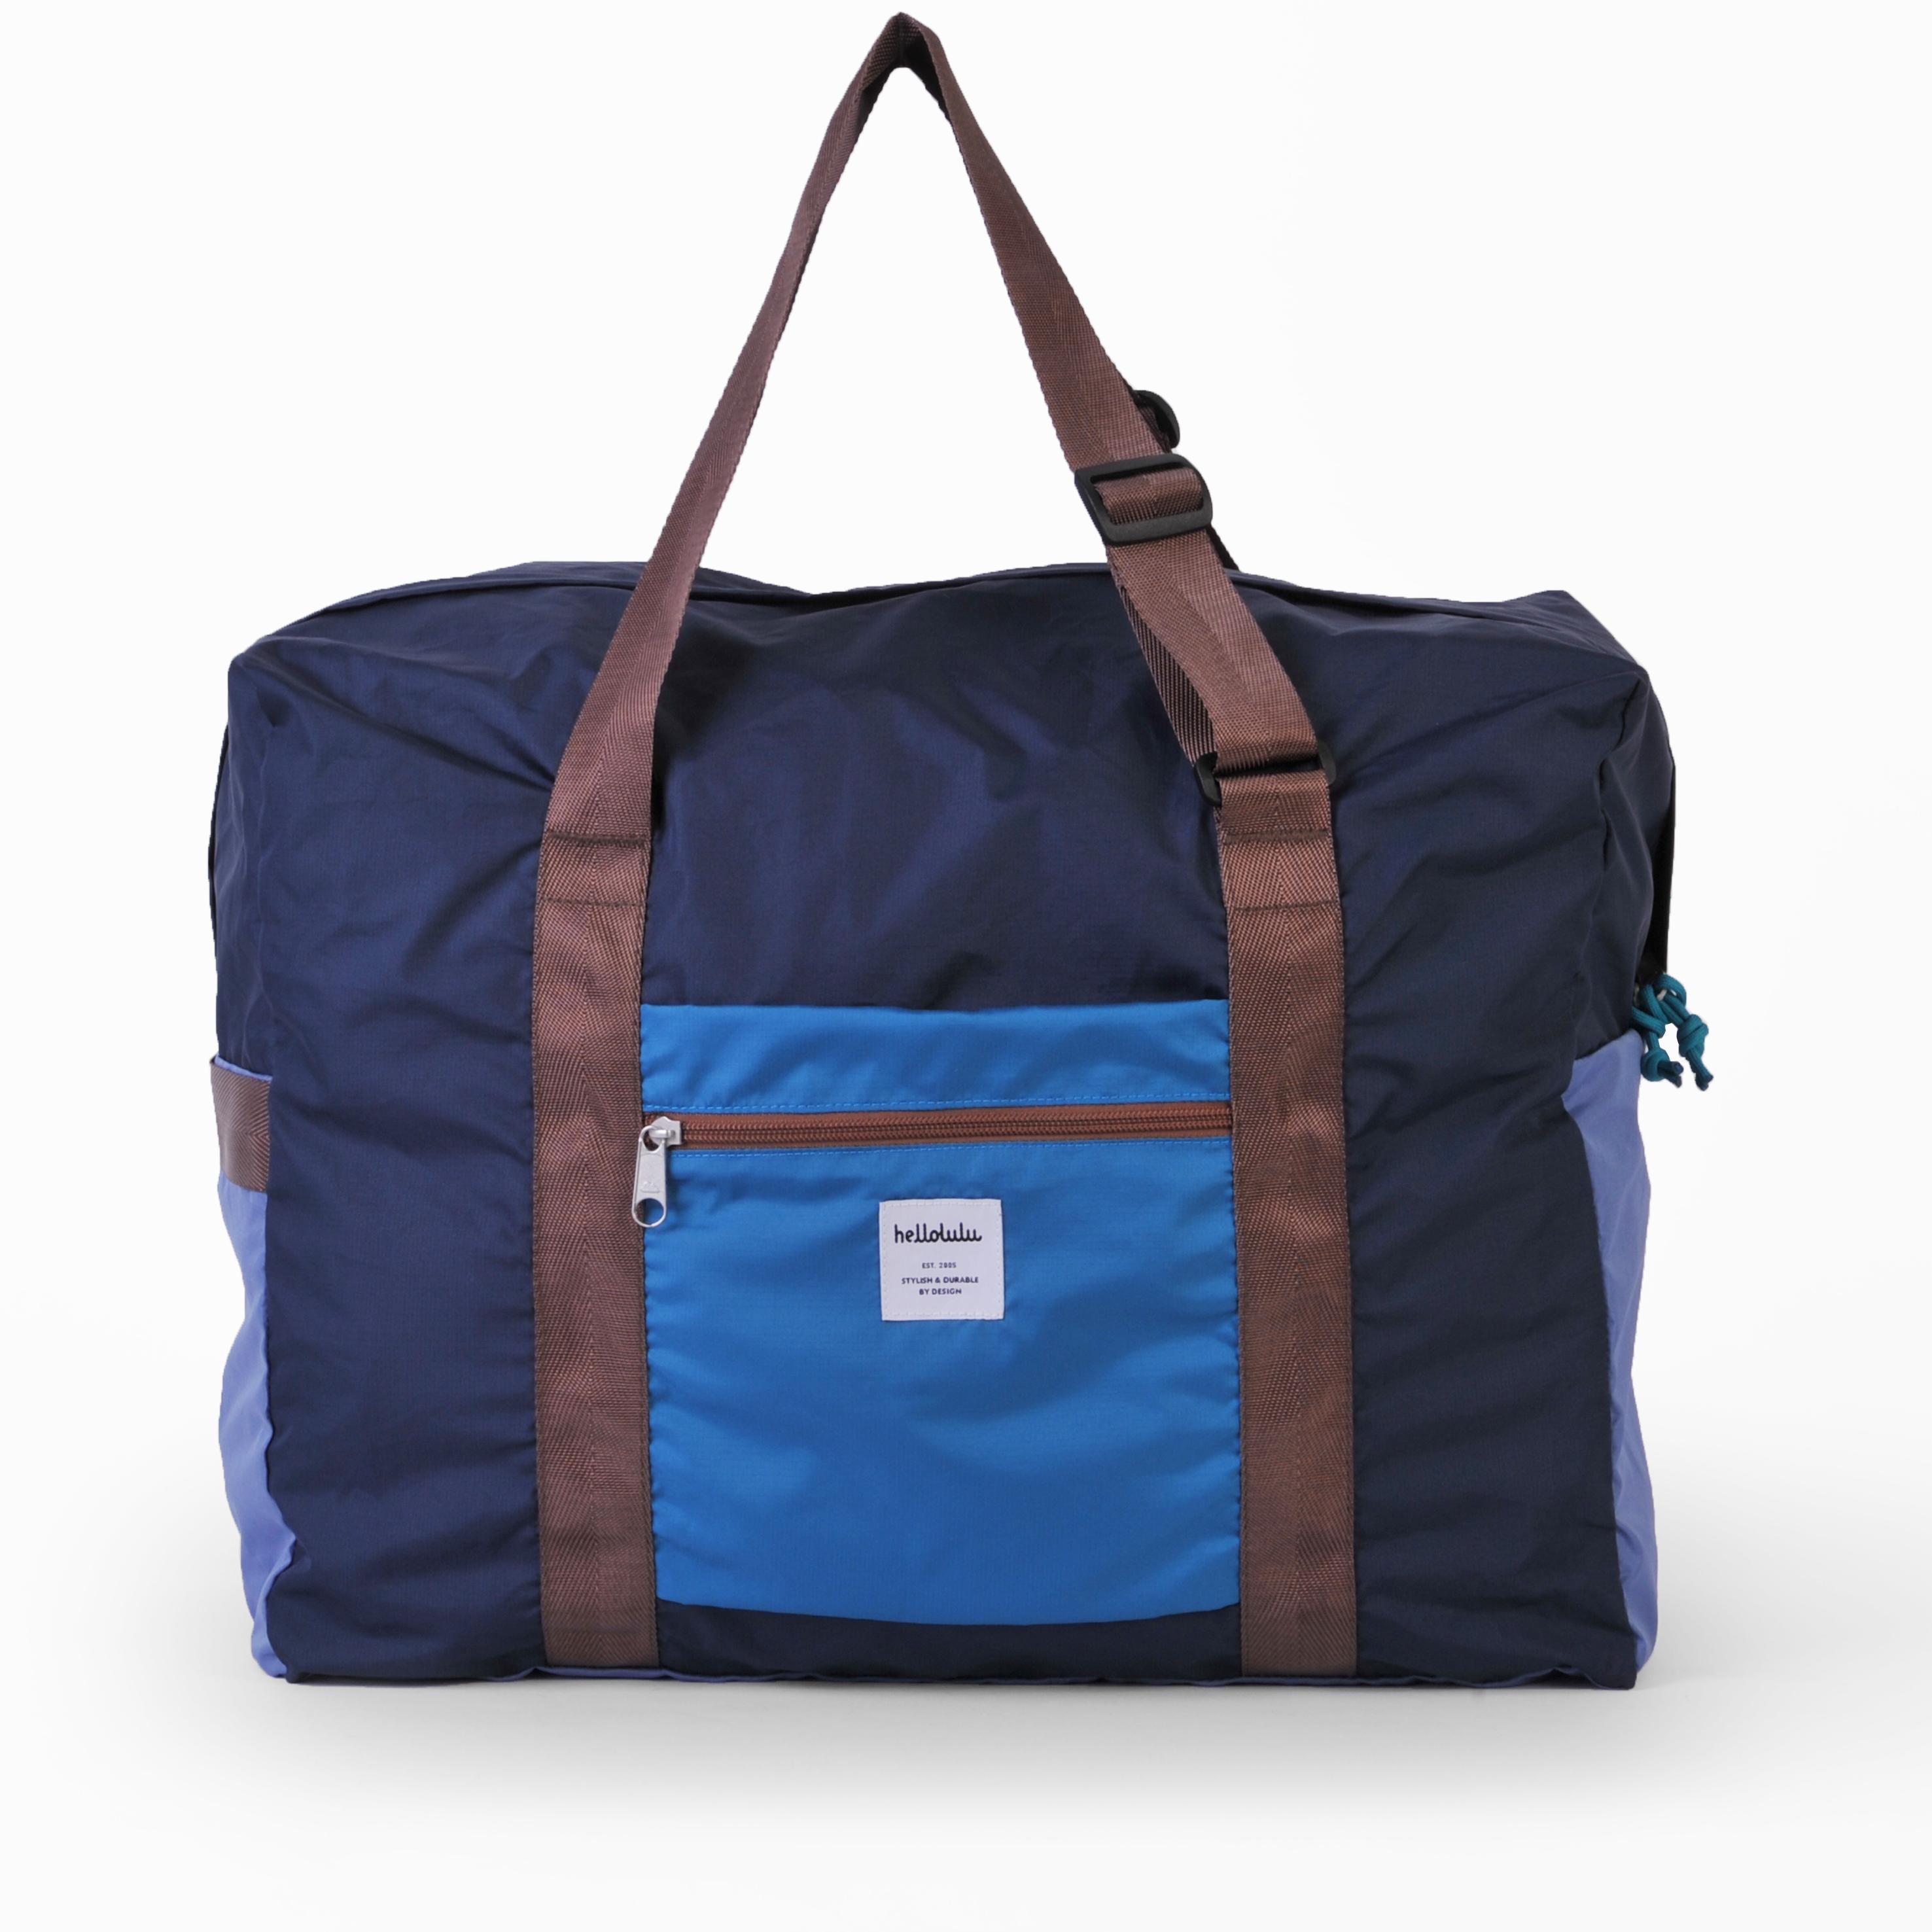 Hellolulu รุ่น HALI - BLUE/LAKE BLUE